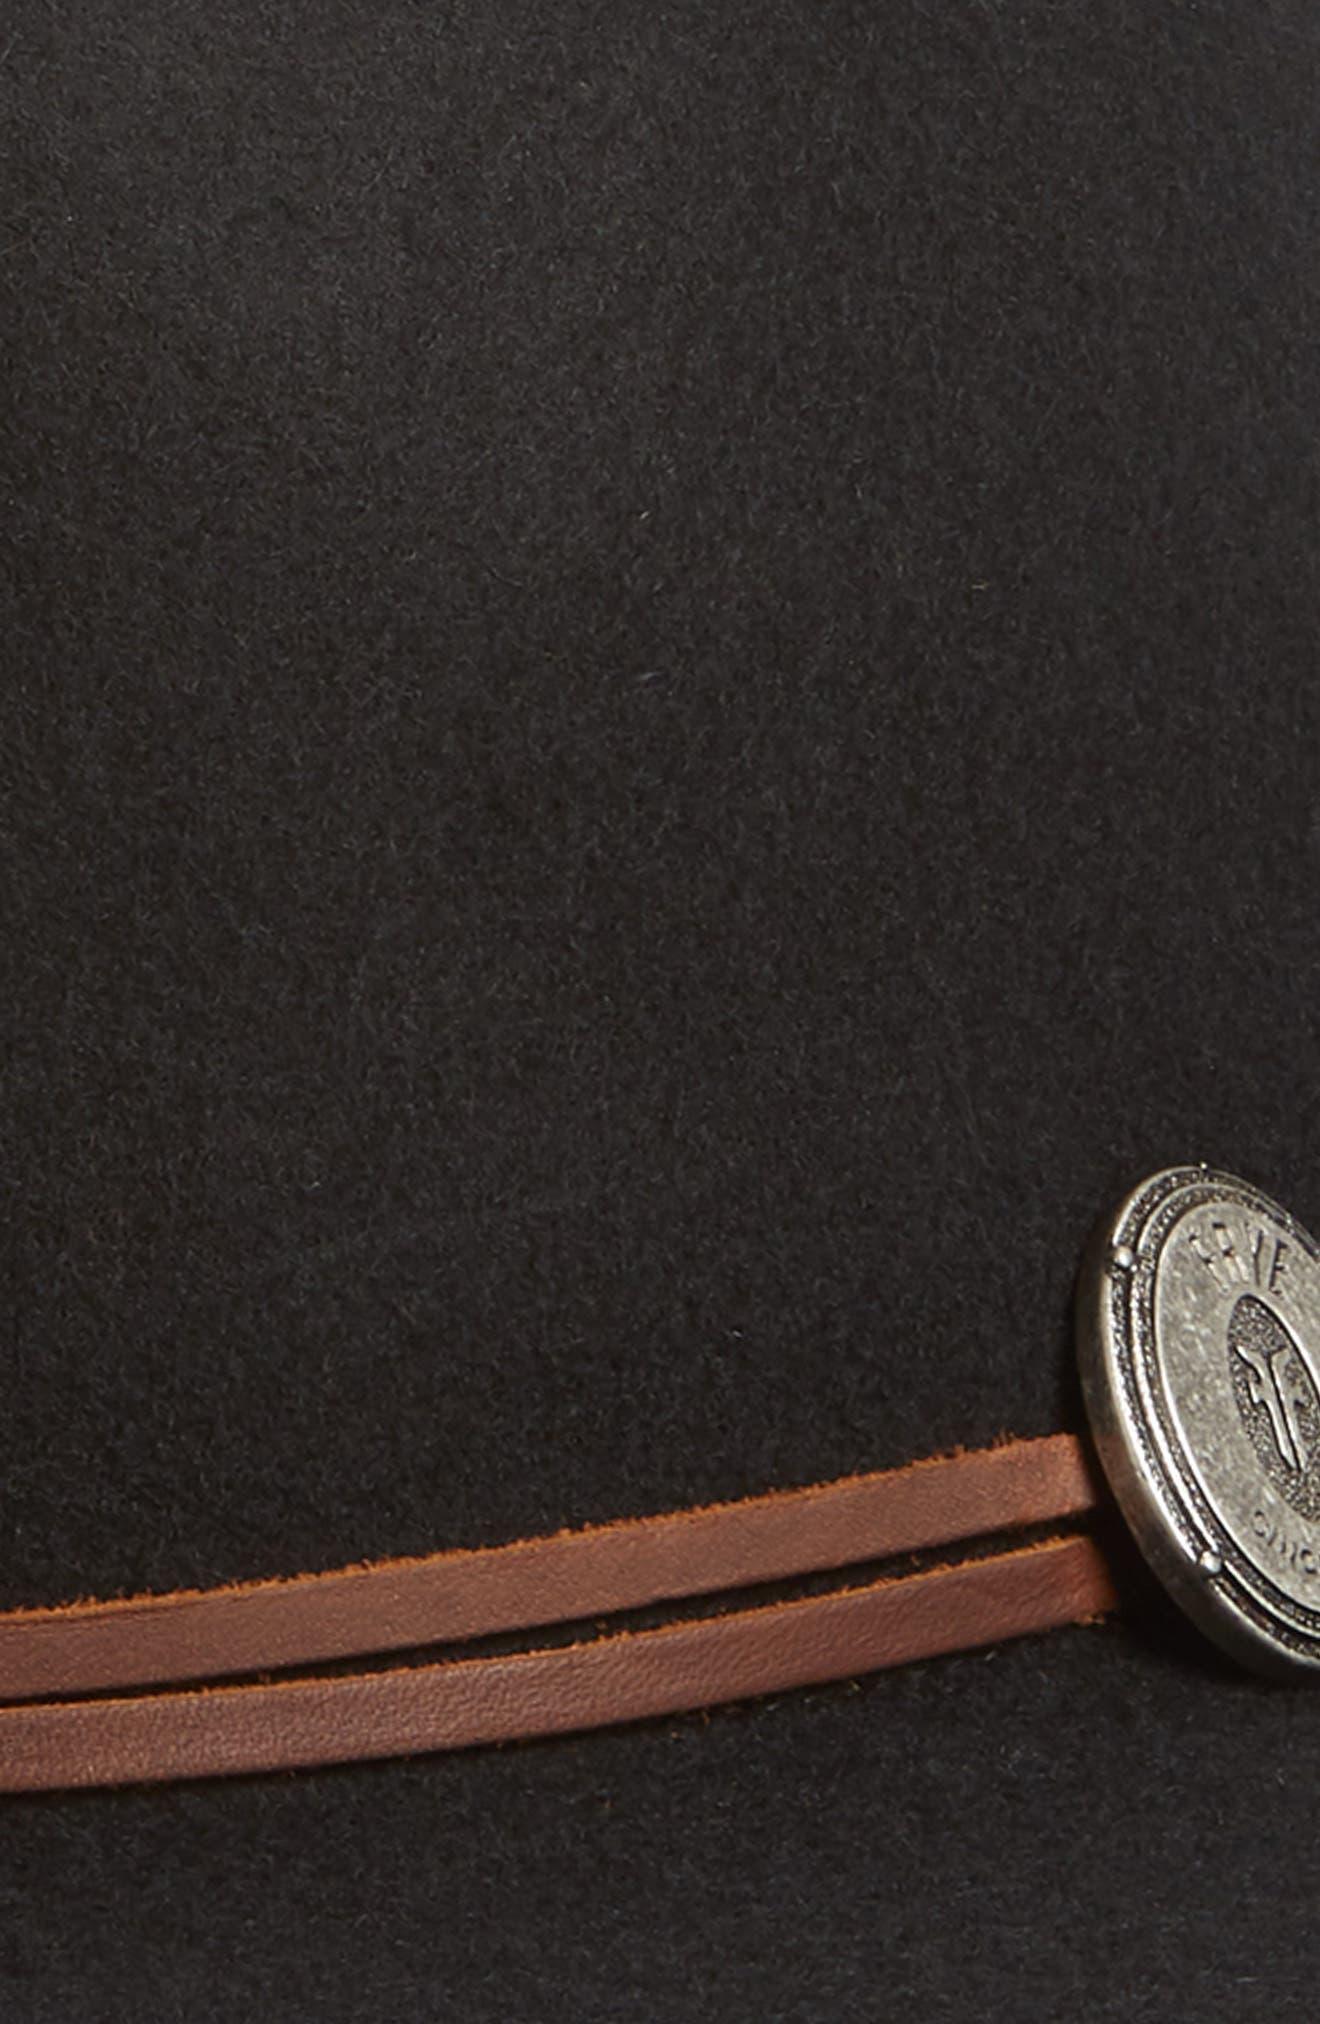 Cadet Dented Crown Wool Felt Hat,                             Alternate thumbnail 2, color,                             BLACK